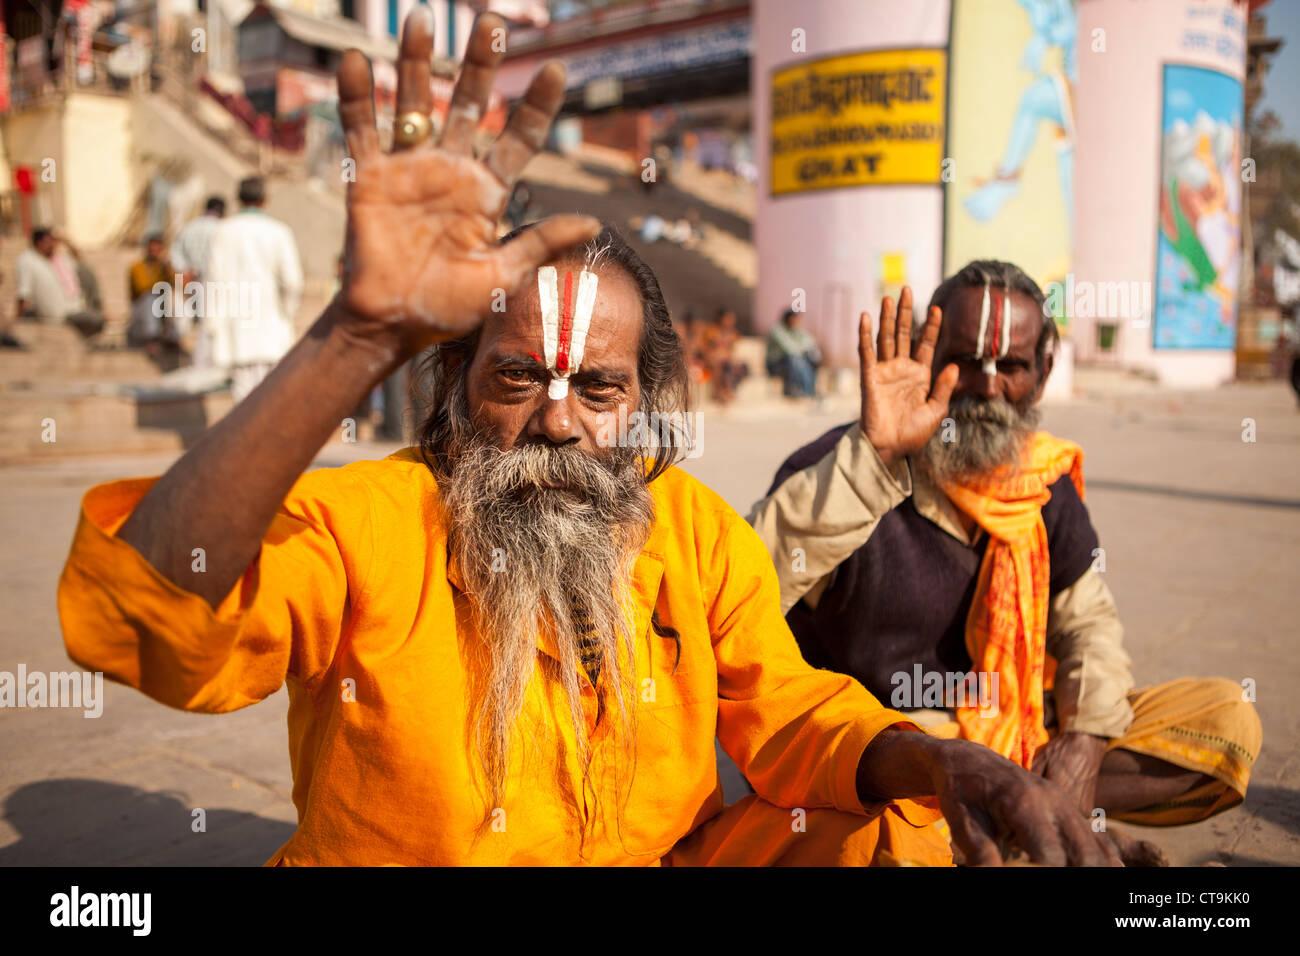 The holy man Sadhu hand up for greeting , Varanasi, Uttar Pradesh, India - Stock Image